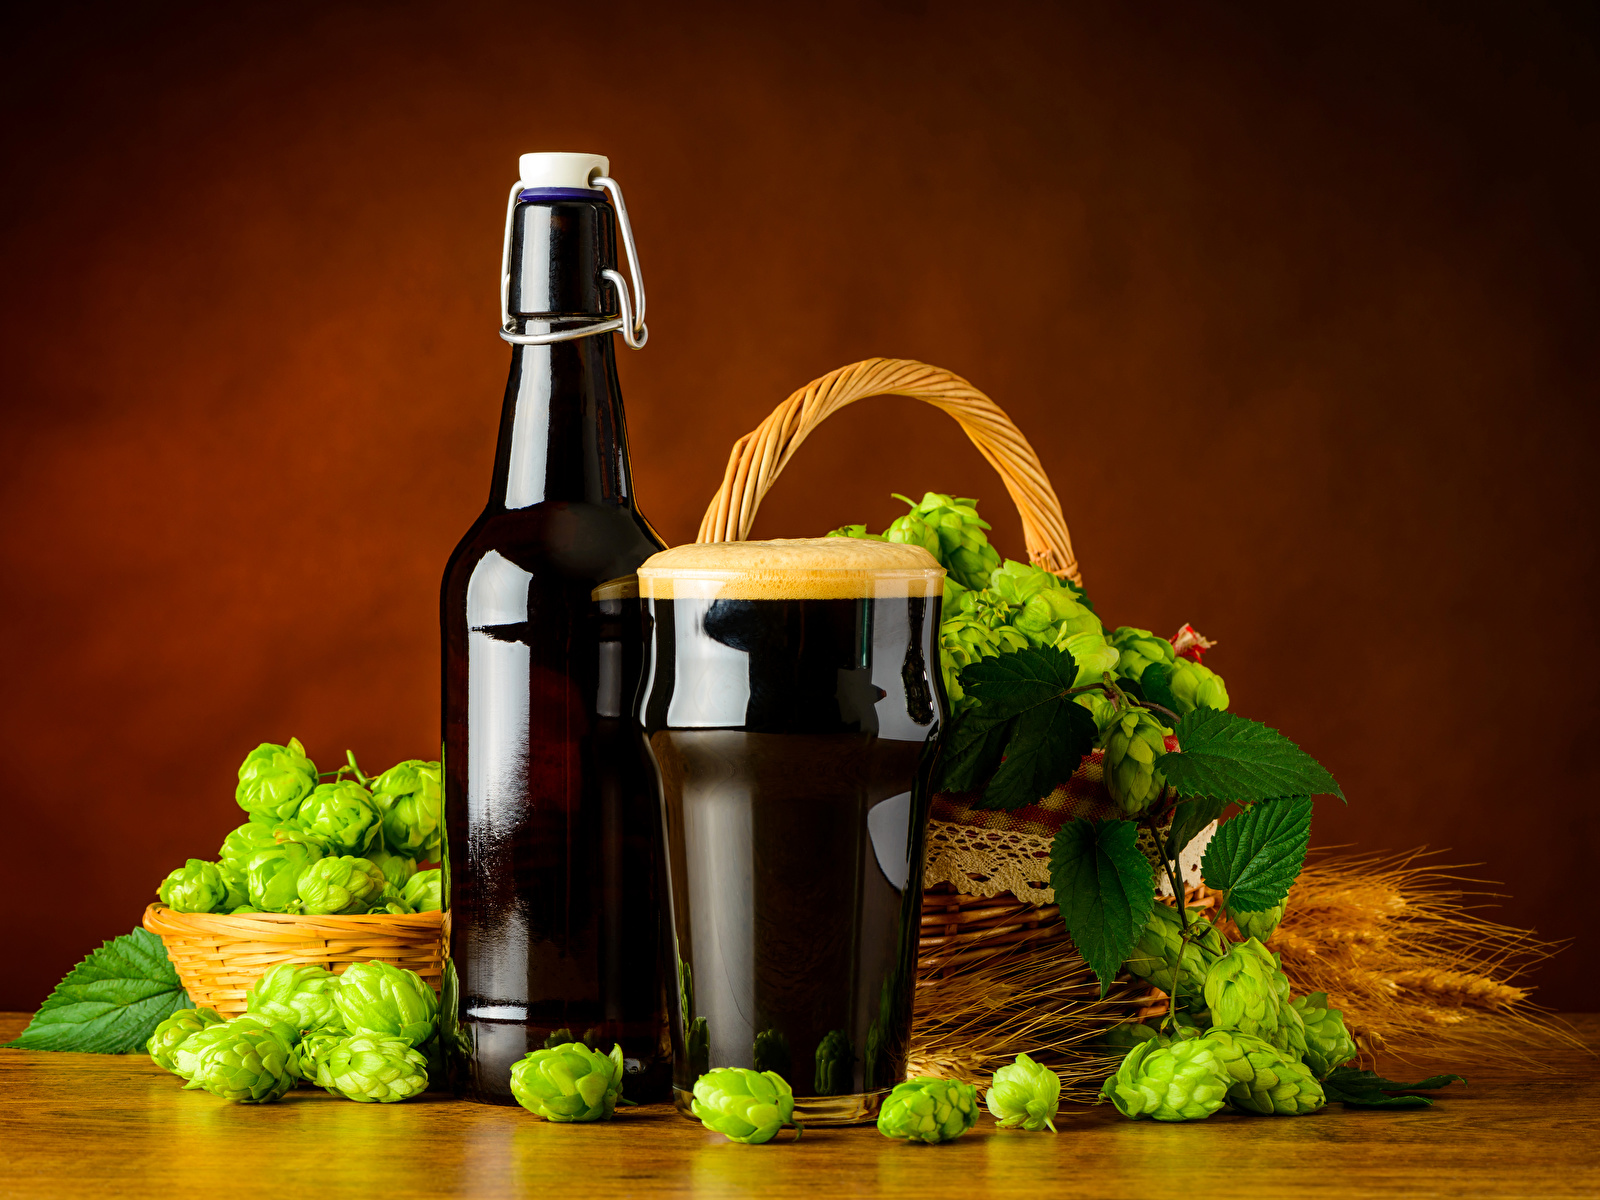 Картинки Пиво Хмель Стакан Пища Пена Бутылка 1600x1200 стакана стакане Еда пене пеной бутылки Продукты питания